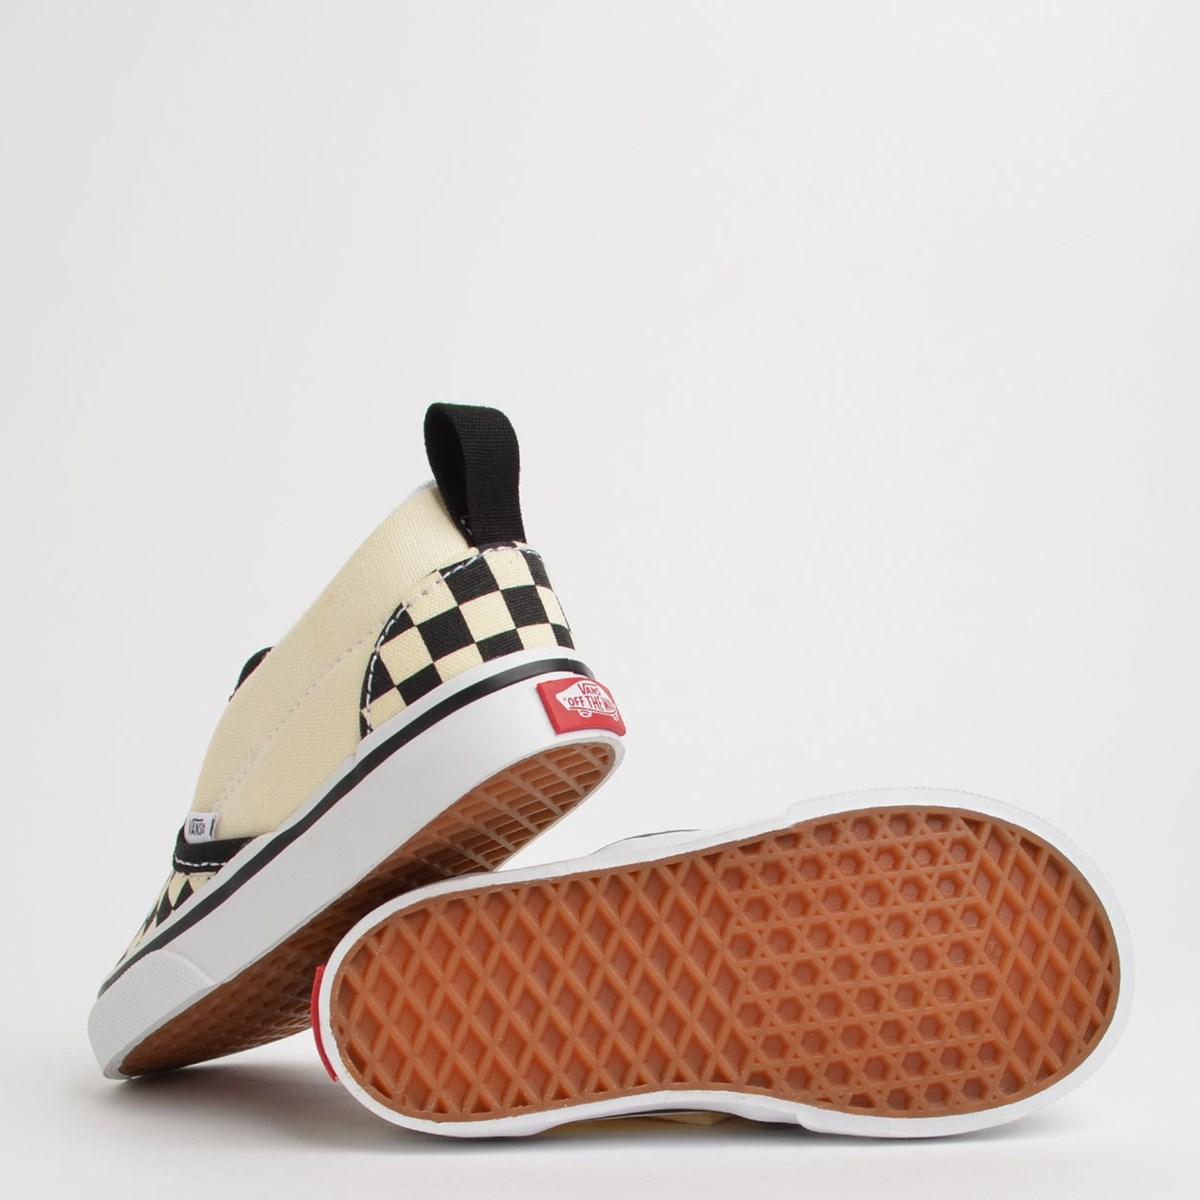 Tênis Vans Kids Slip On V Checkerboard Black White VN0A34885GX